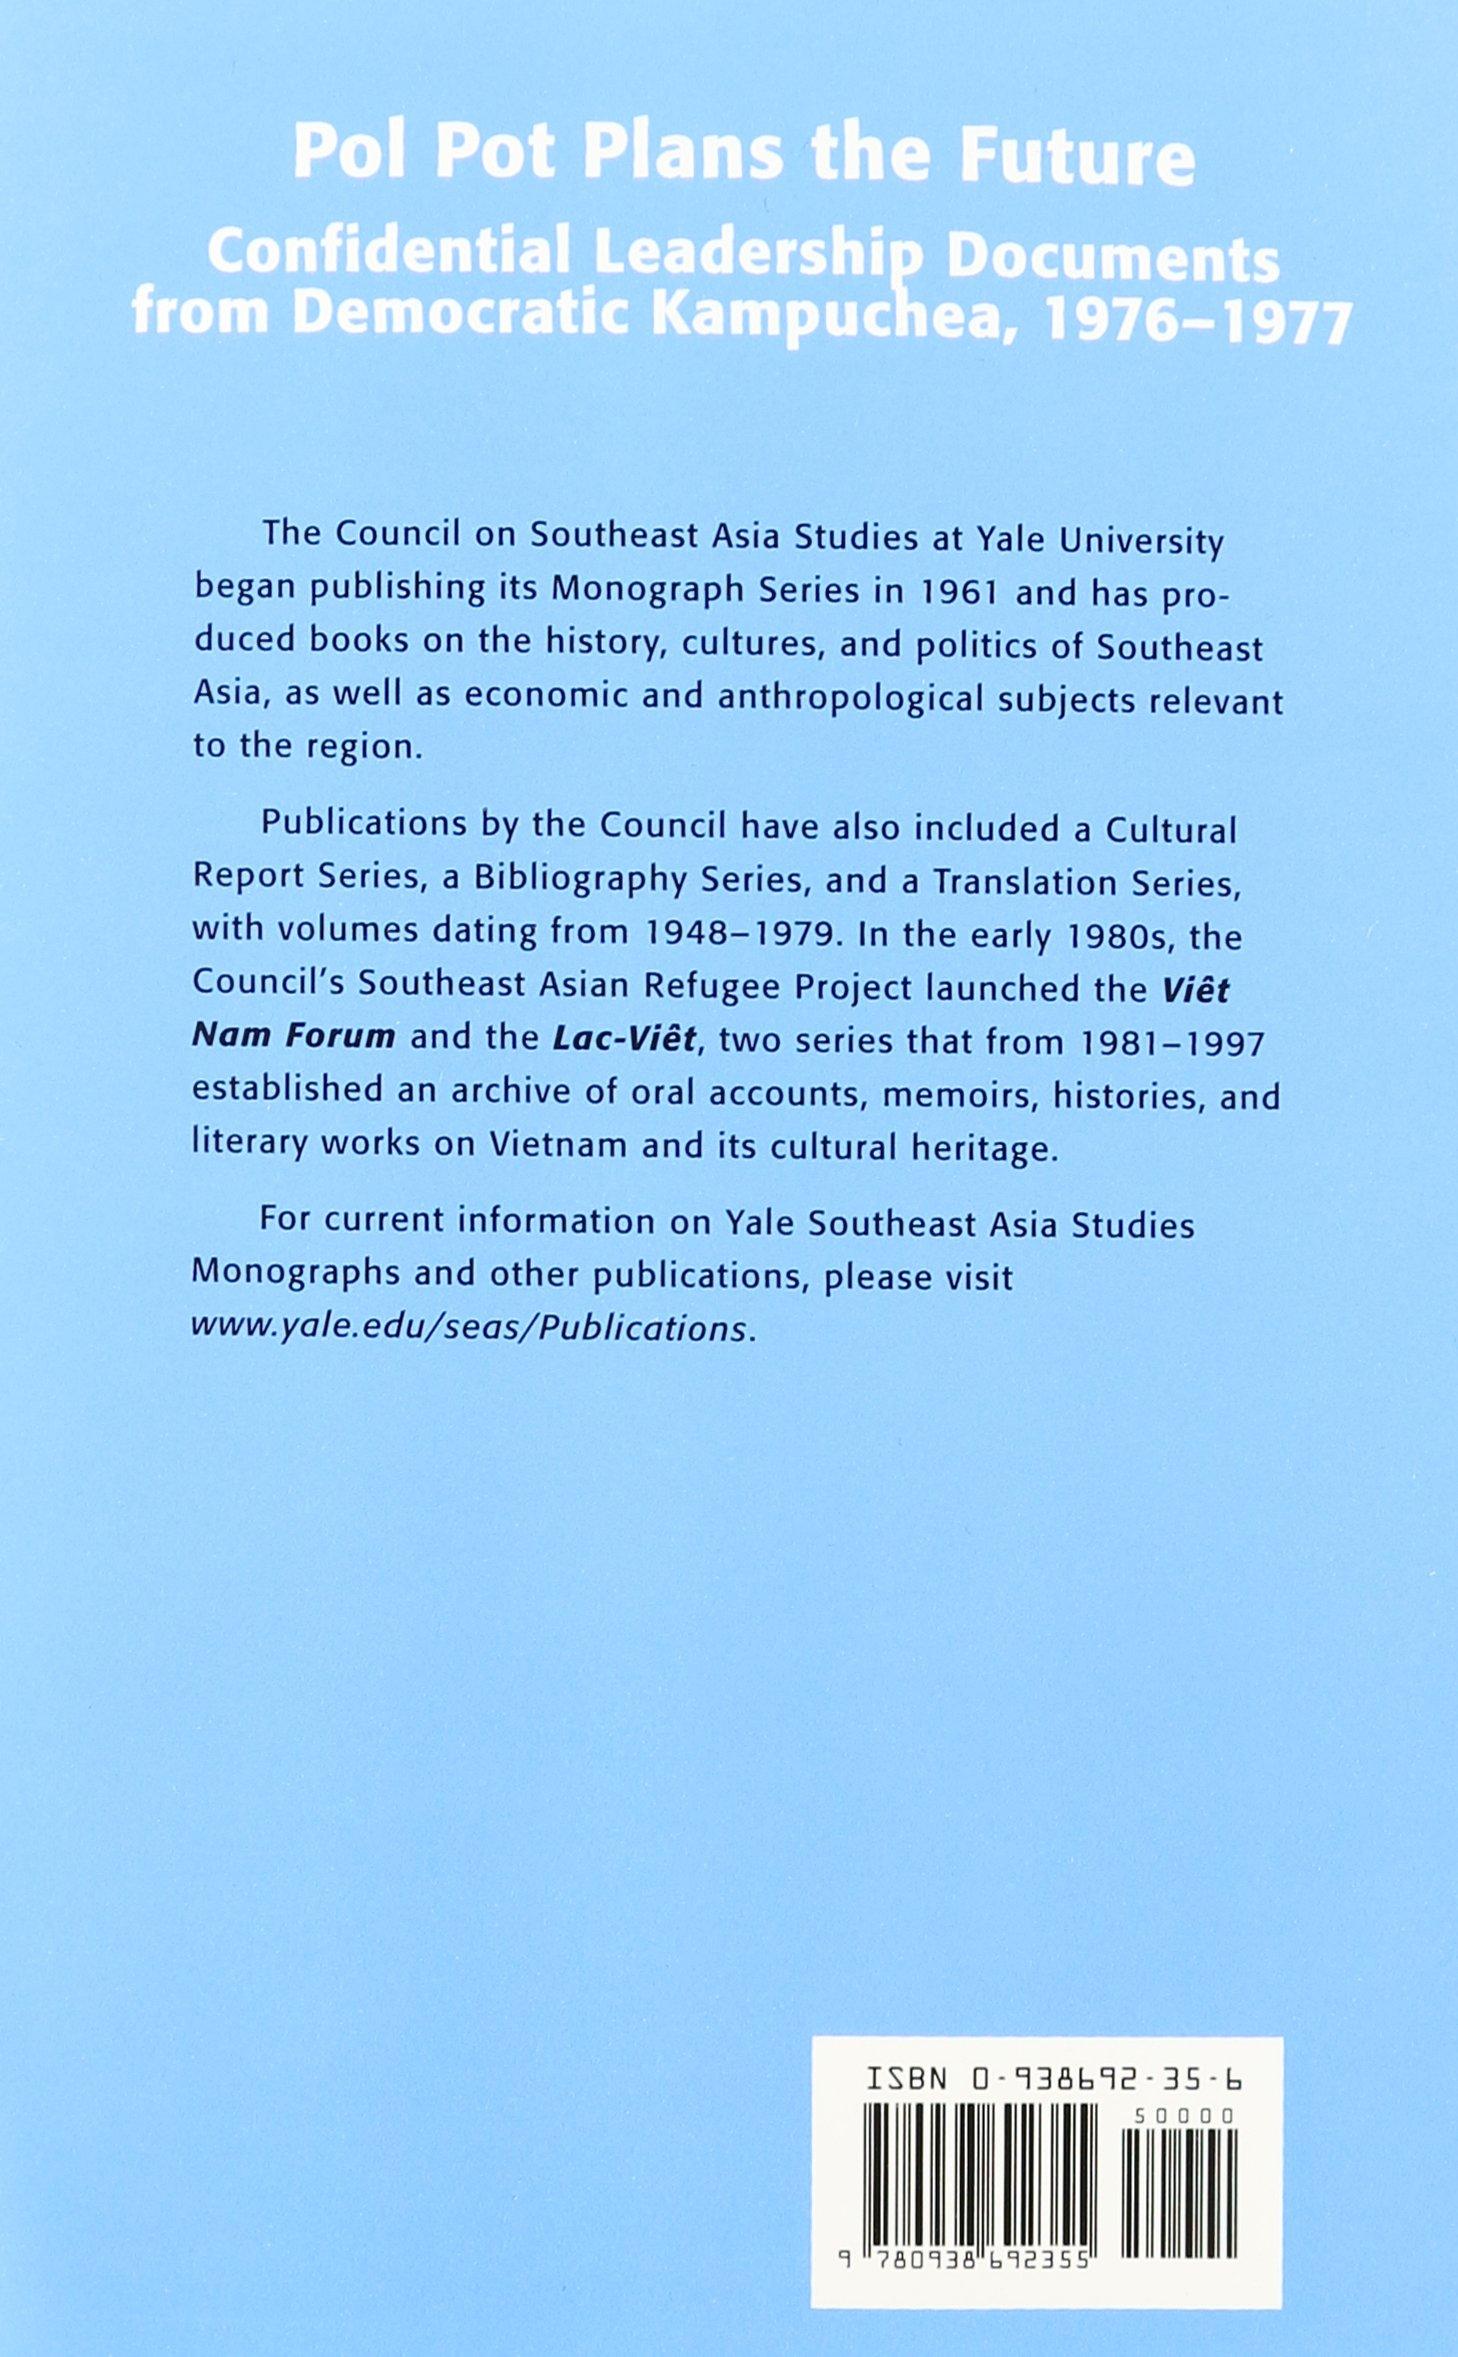 Amazon.com: Pol Pot Plans the Future: Confidential Leadership ...